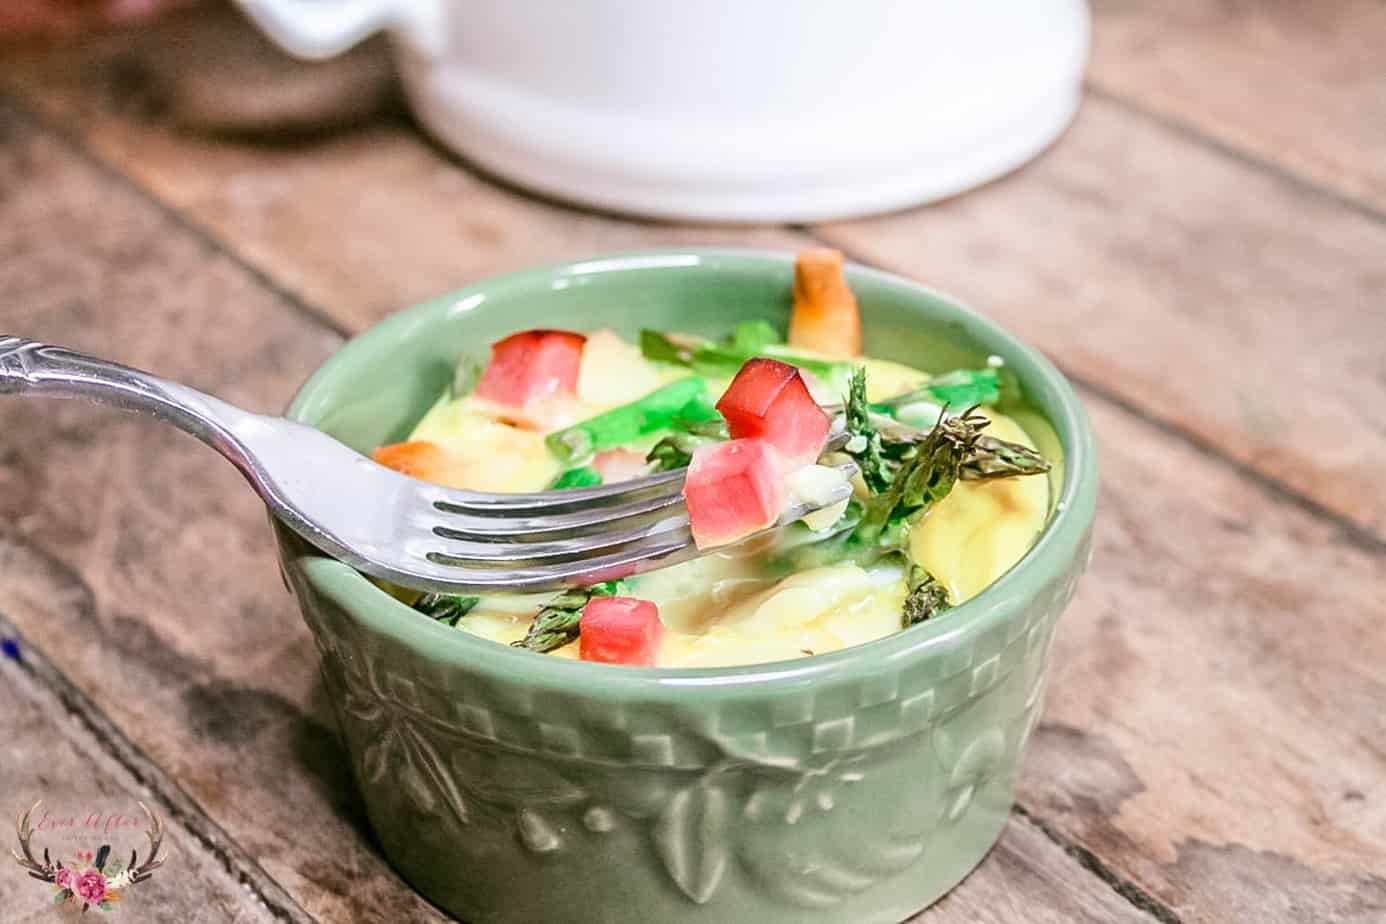 crust less quiche | crustless quiche | low carb | egg recipe